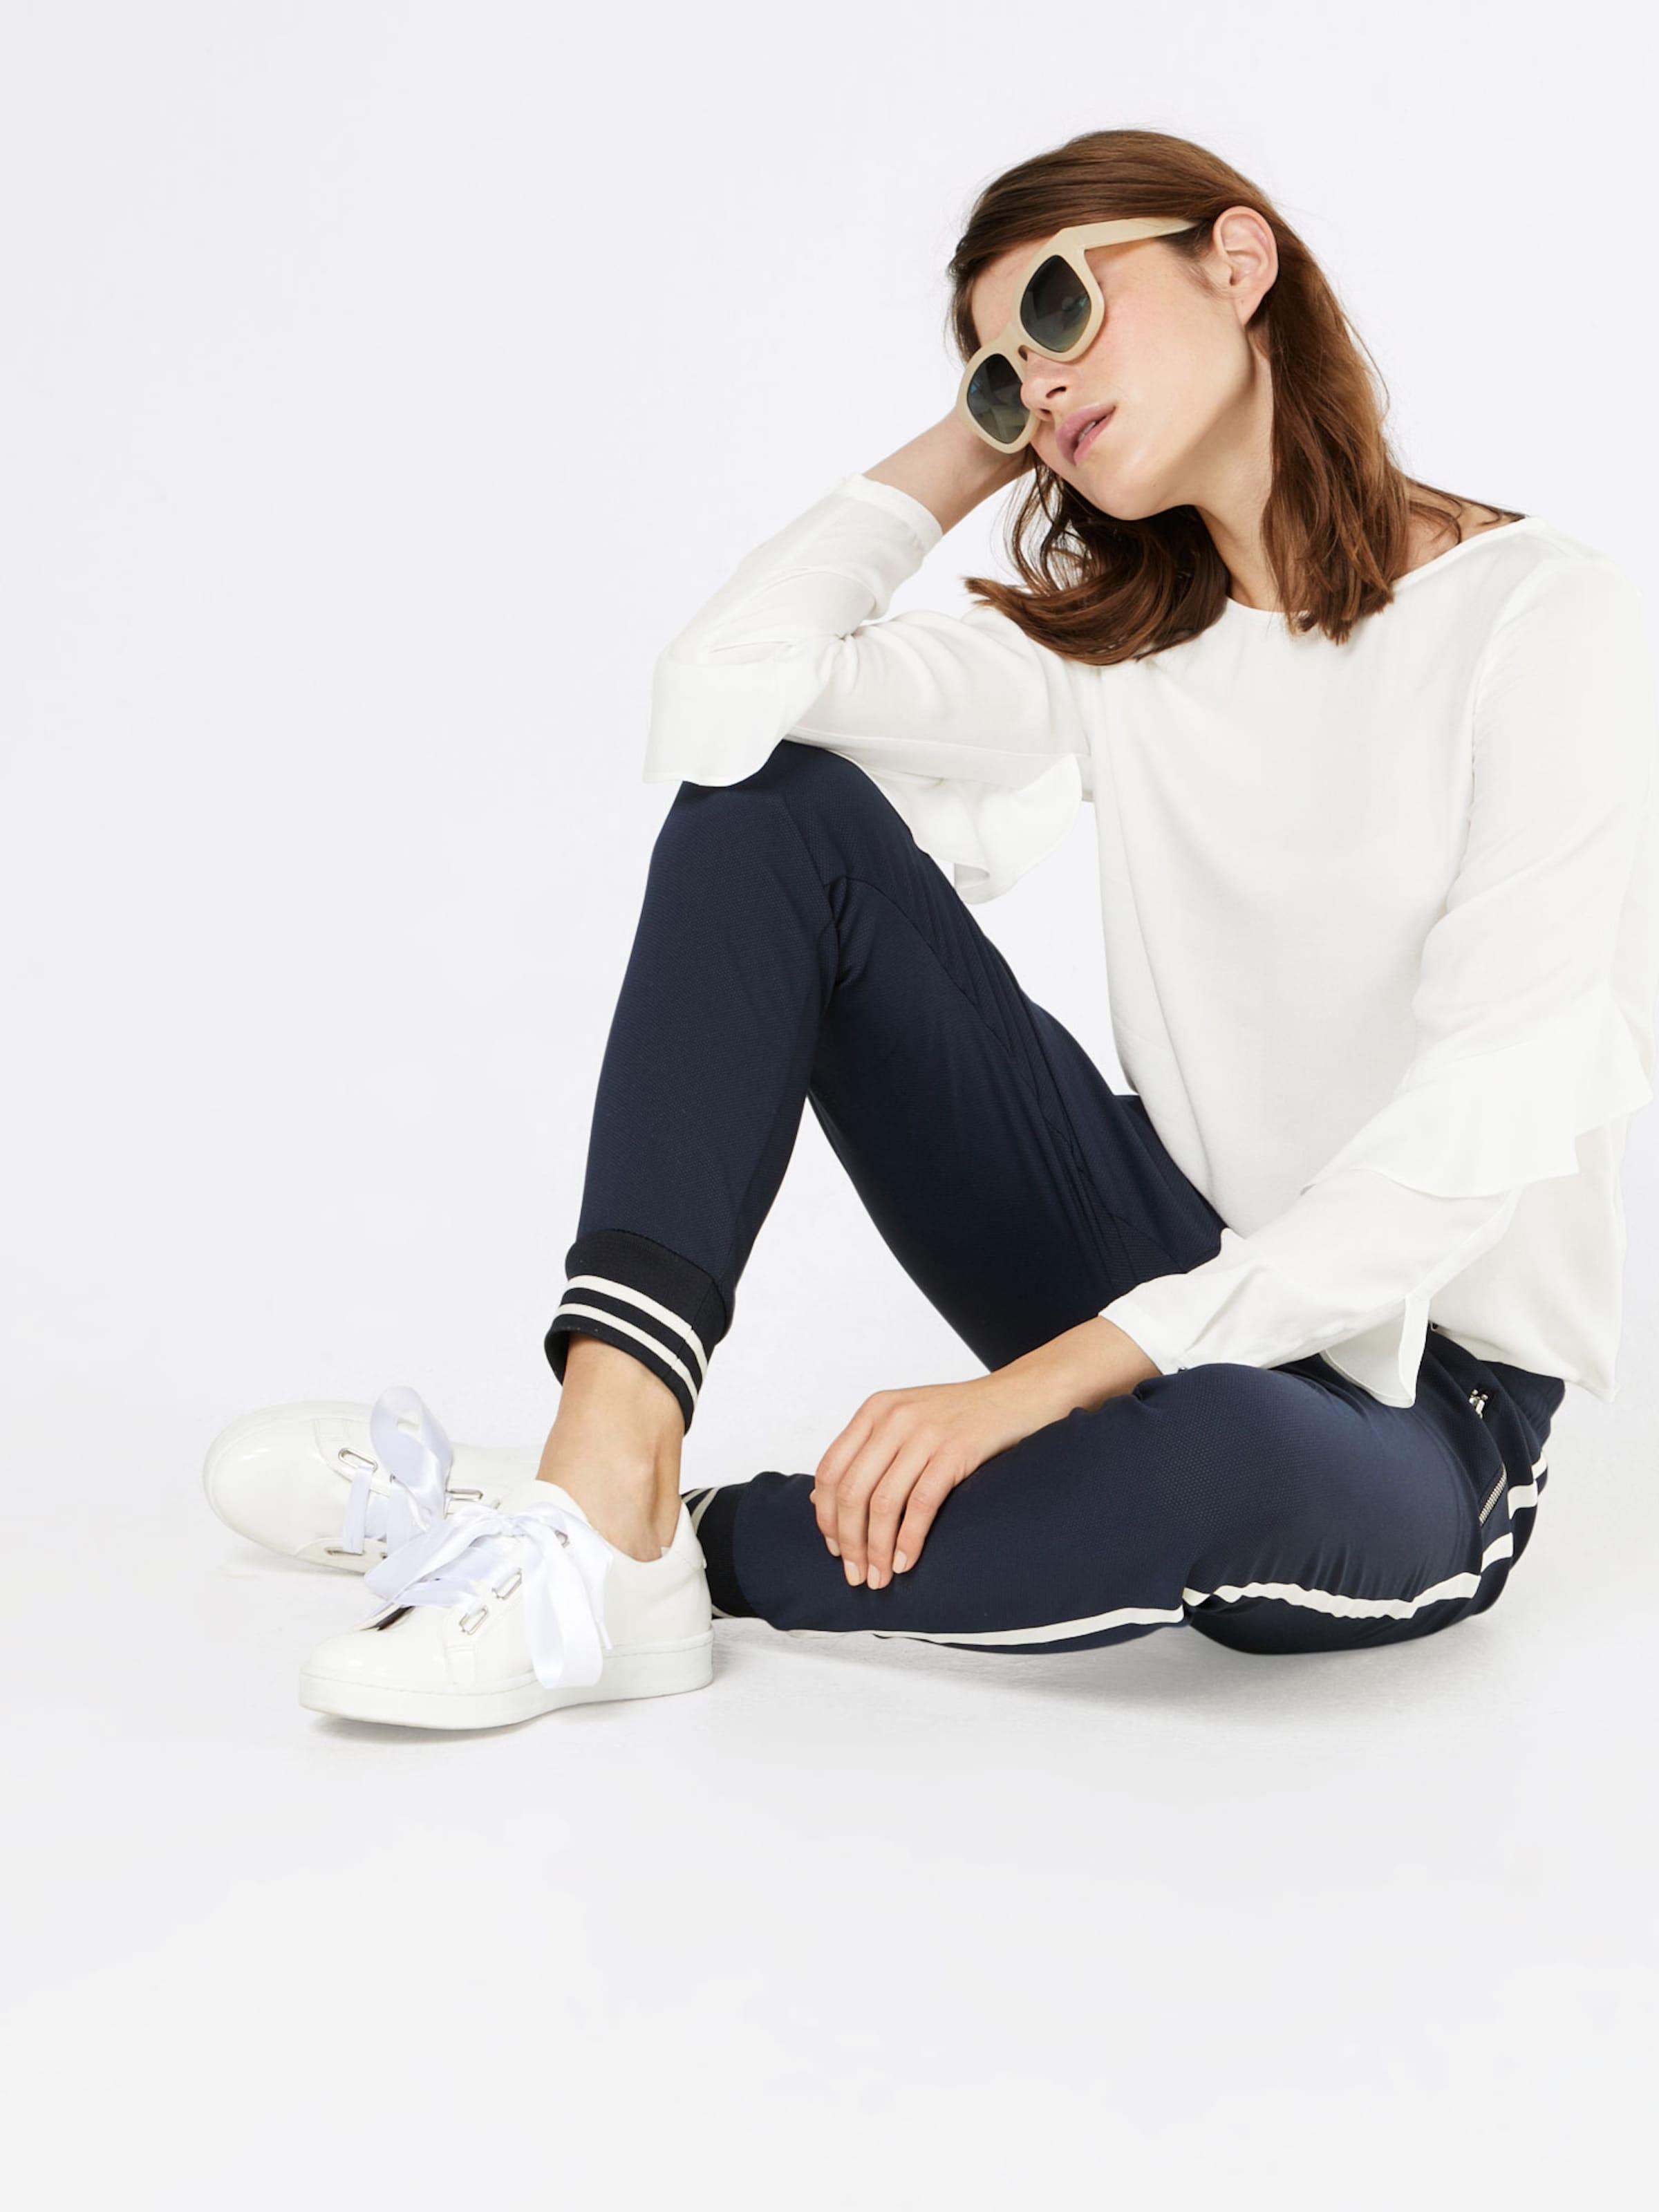 En Tunique En 'woven' 'woven' Esprit Blanc 'woven' Tunique Esprit Tunique Blanc Esprit En thQsdrCx